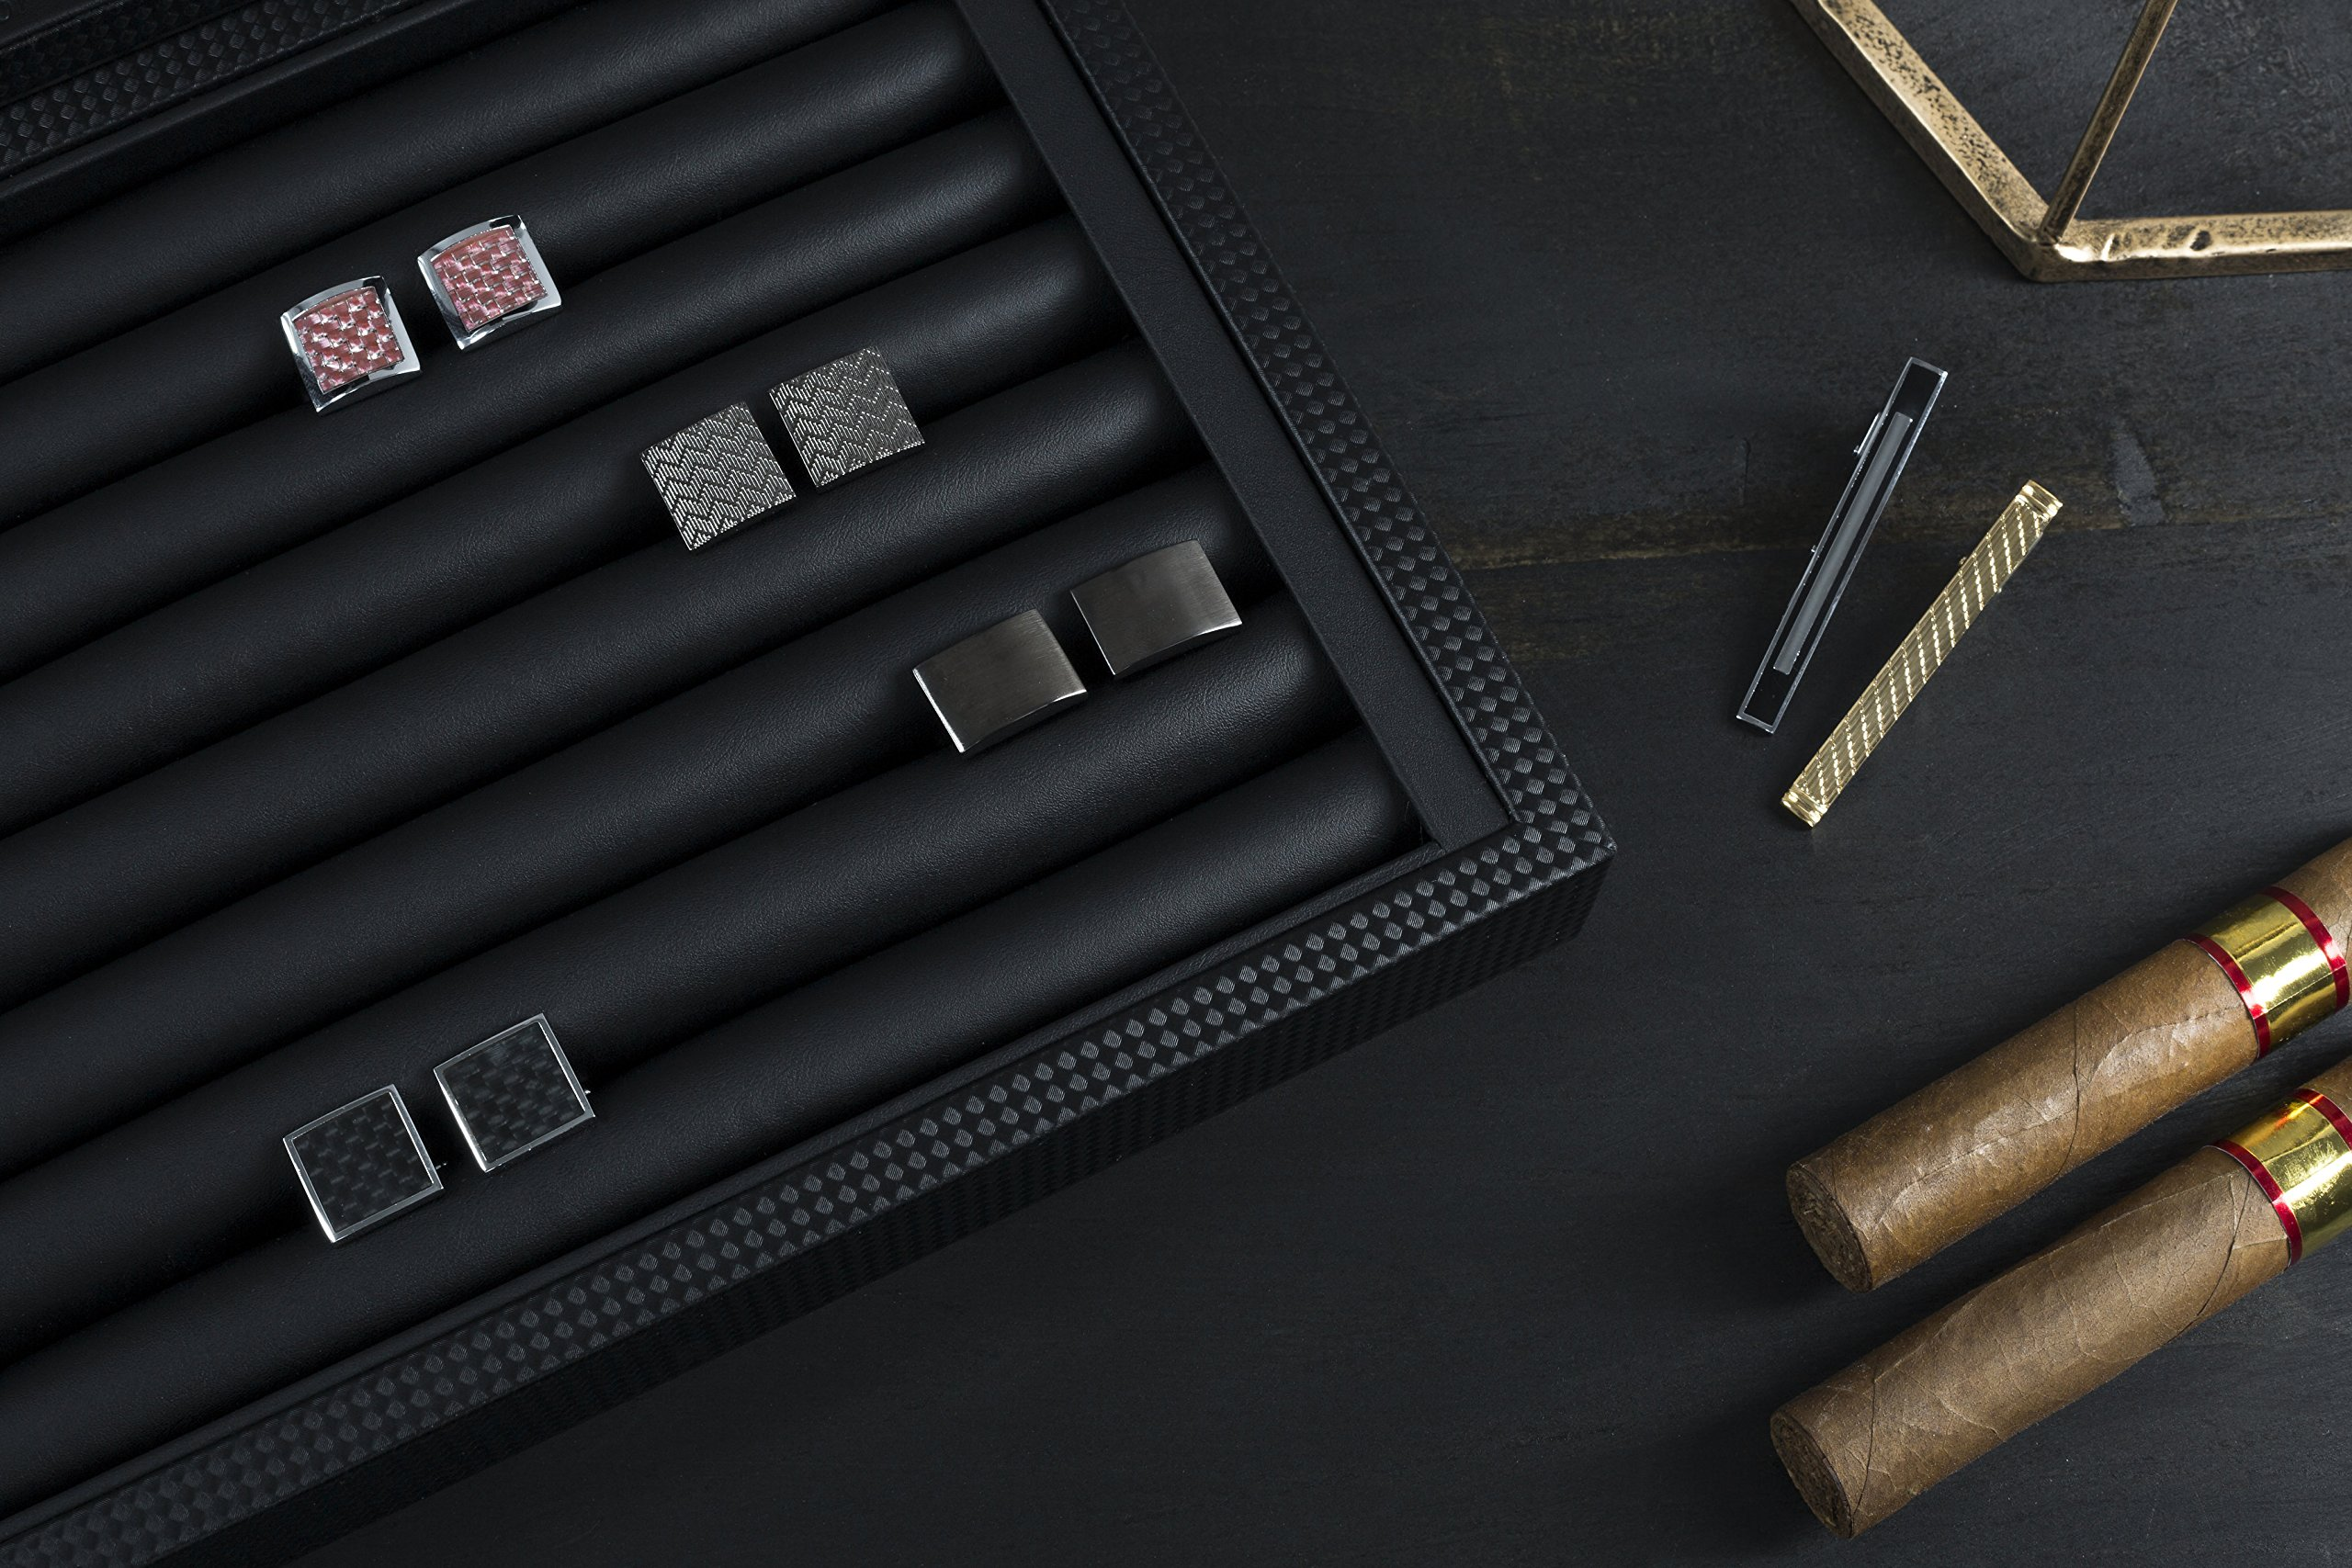 Glenor Co Cufflink Box for Men - Holds 70 Cufflinks - Luxury Display Jewelry Case -Carbon Fiber Design - Metal Buckle Holder, Large Glass Top - Black by Glenor Co (Image #6)